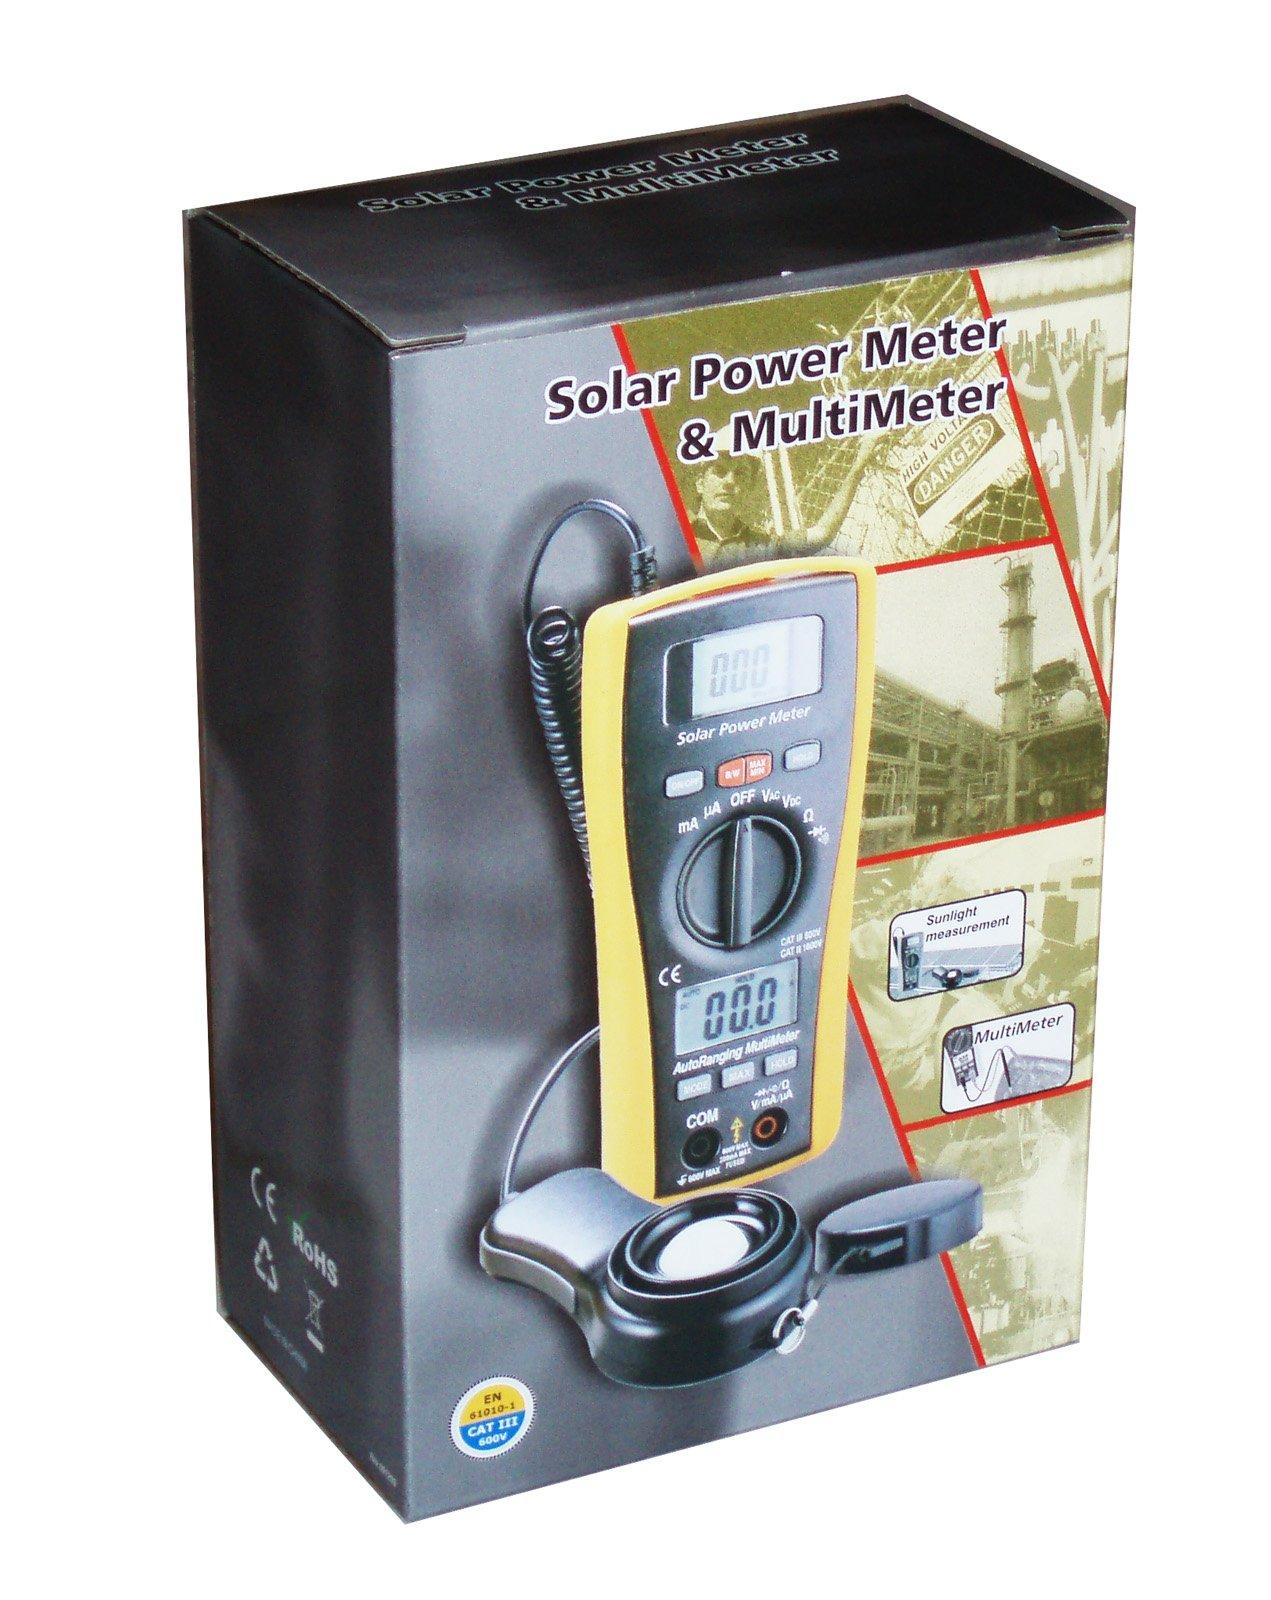 LA-1017 Sun Power Solar Energy Sunlight Meter with DMM Digital Multimeter